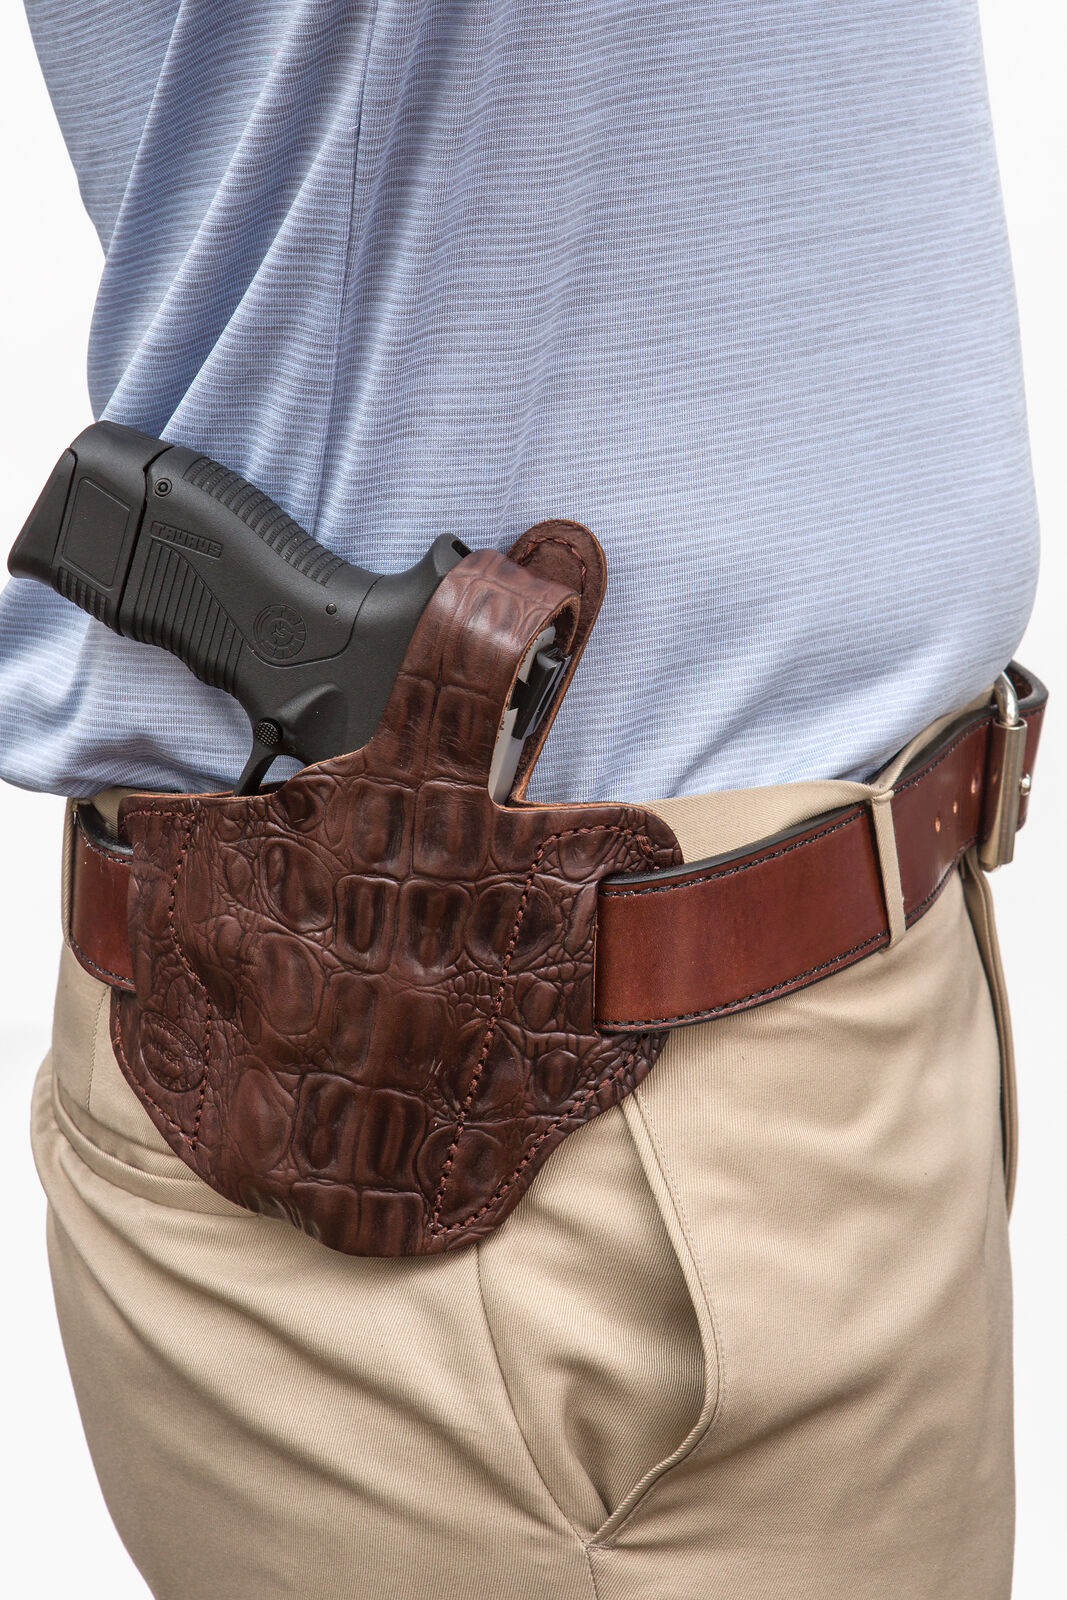 On Duty Conceal RH Holster LH OWB Leder Gun Holster RH For Colt XSE 4